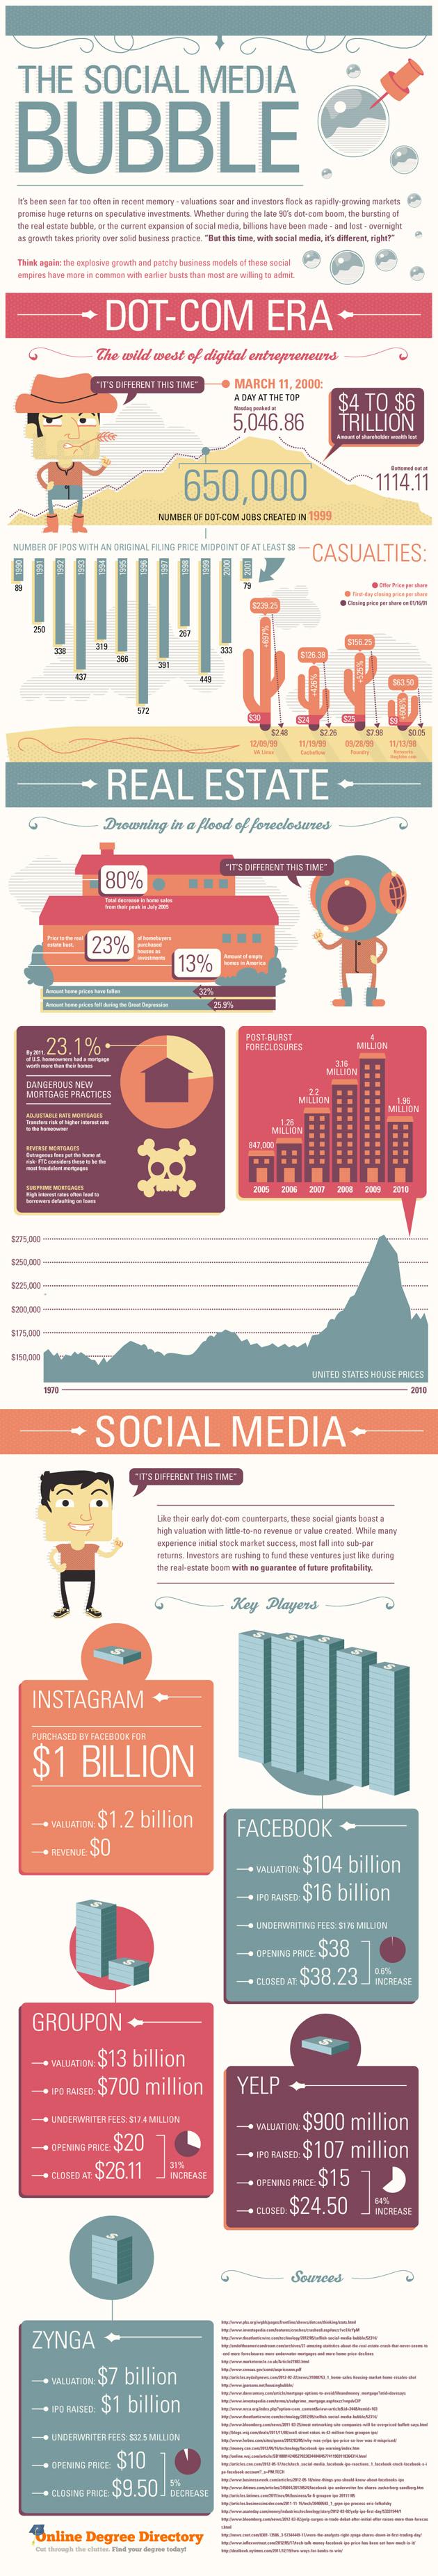 The Social Media Bubble